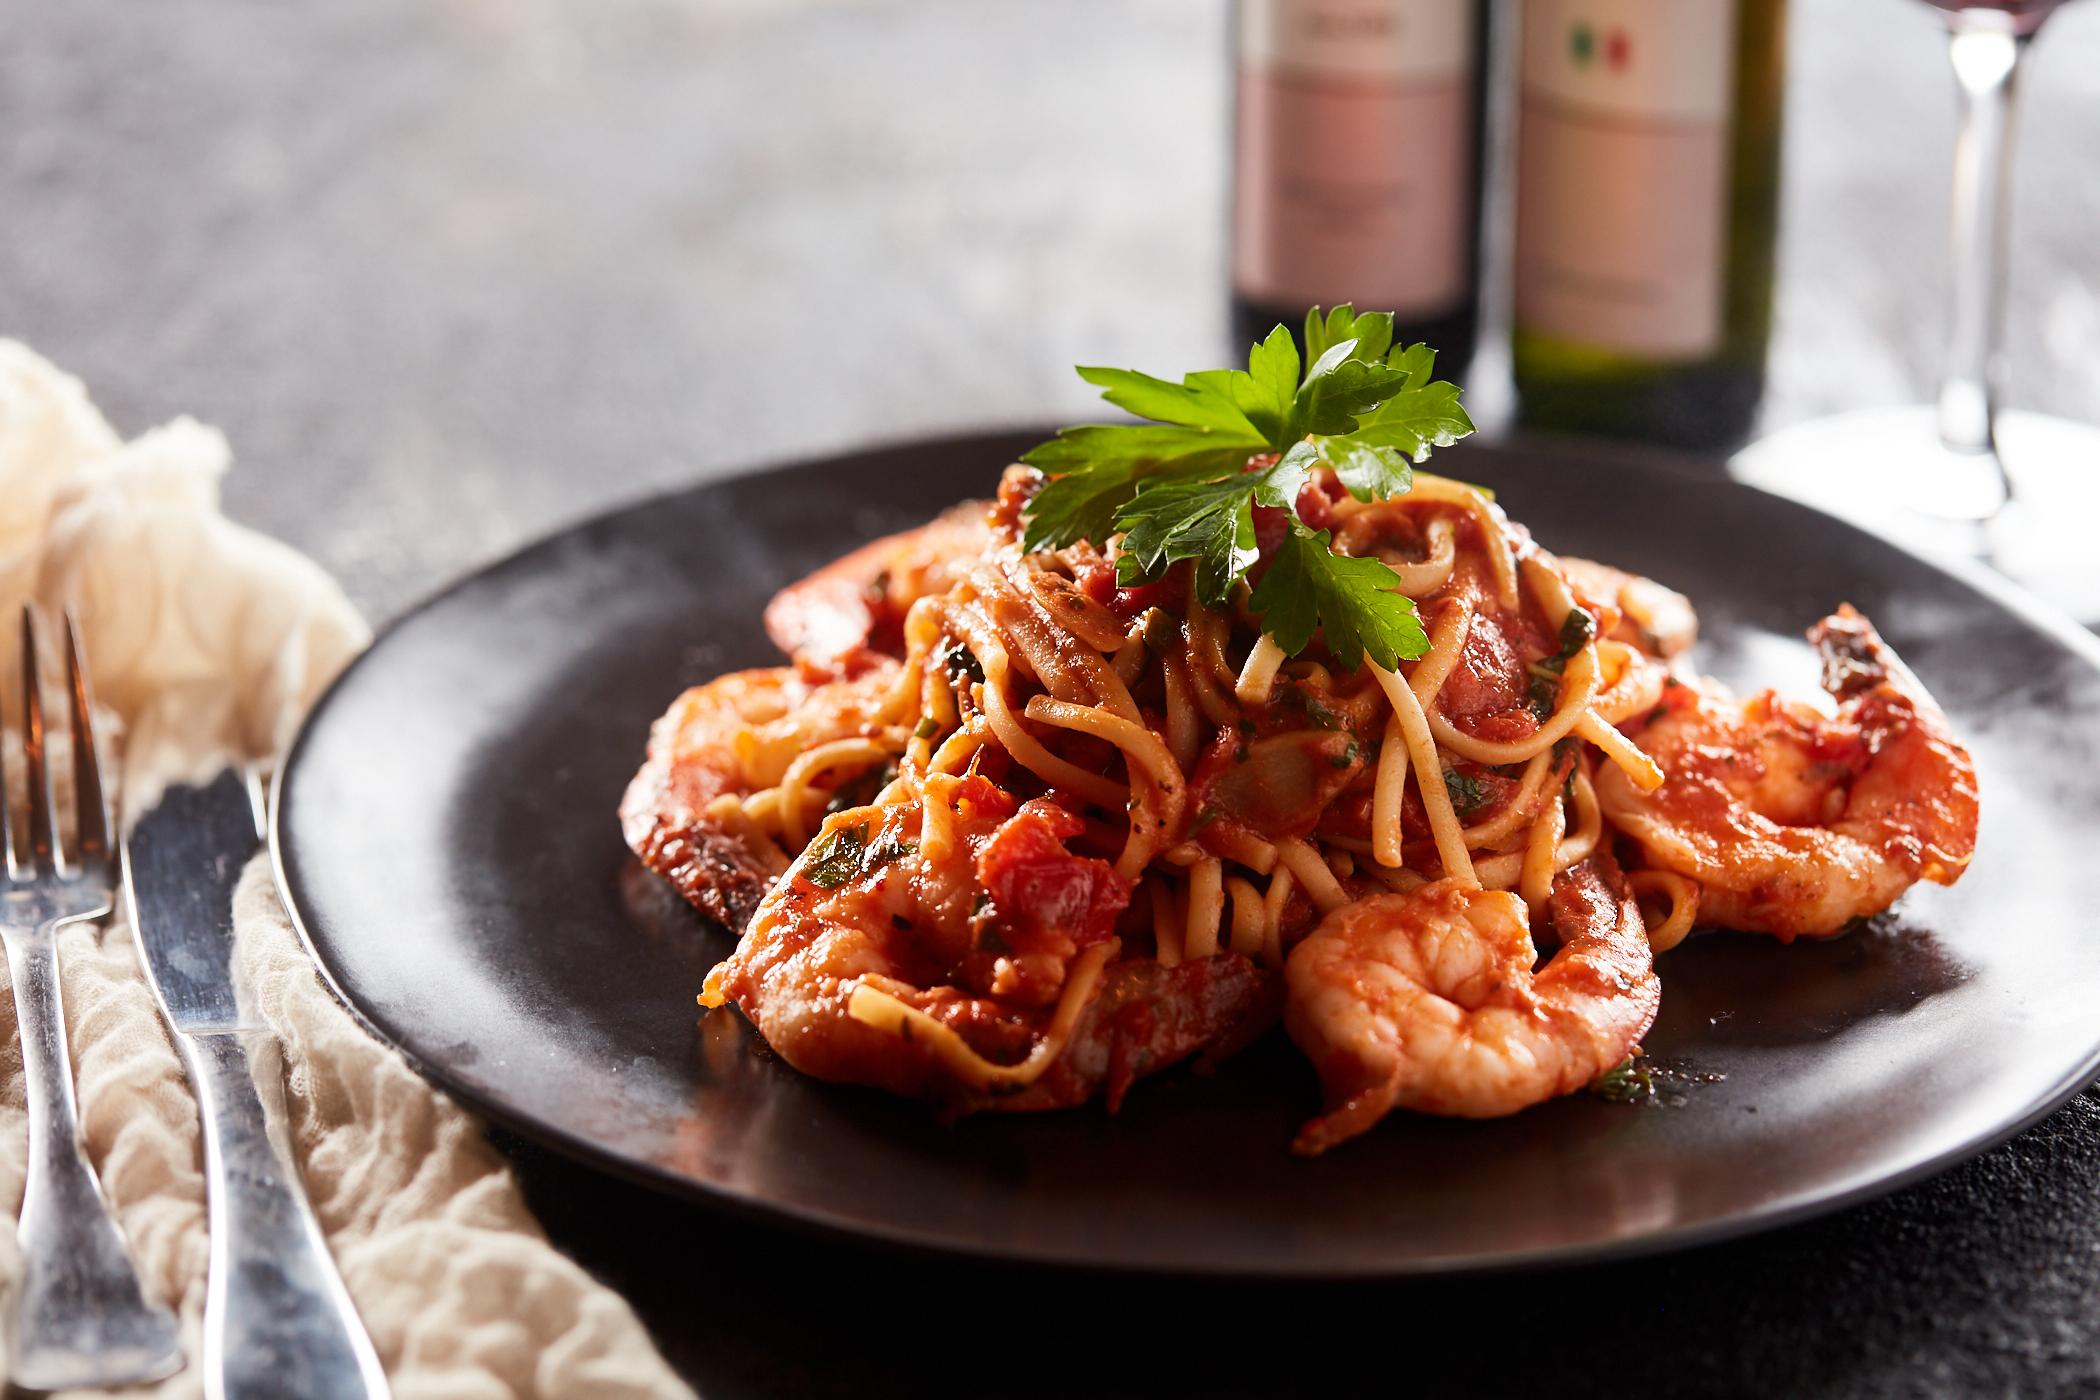 Lynora S Restaurant Food Photography Libby Vision South Florida South Florida S Best Food Photography